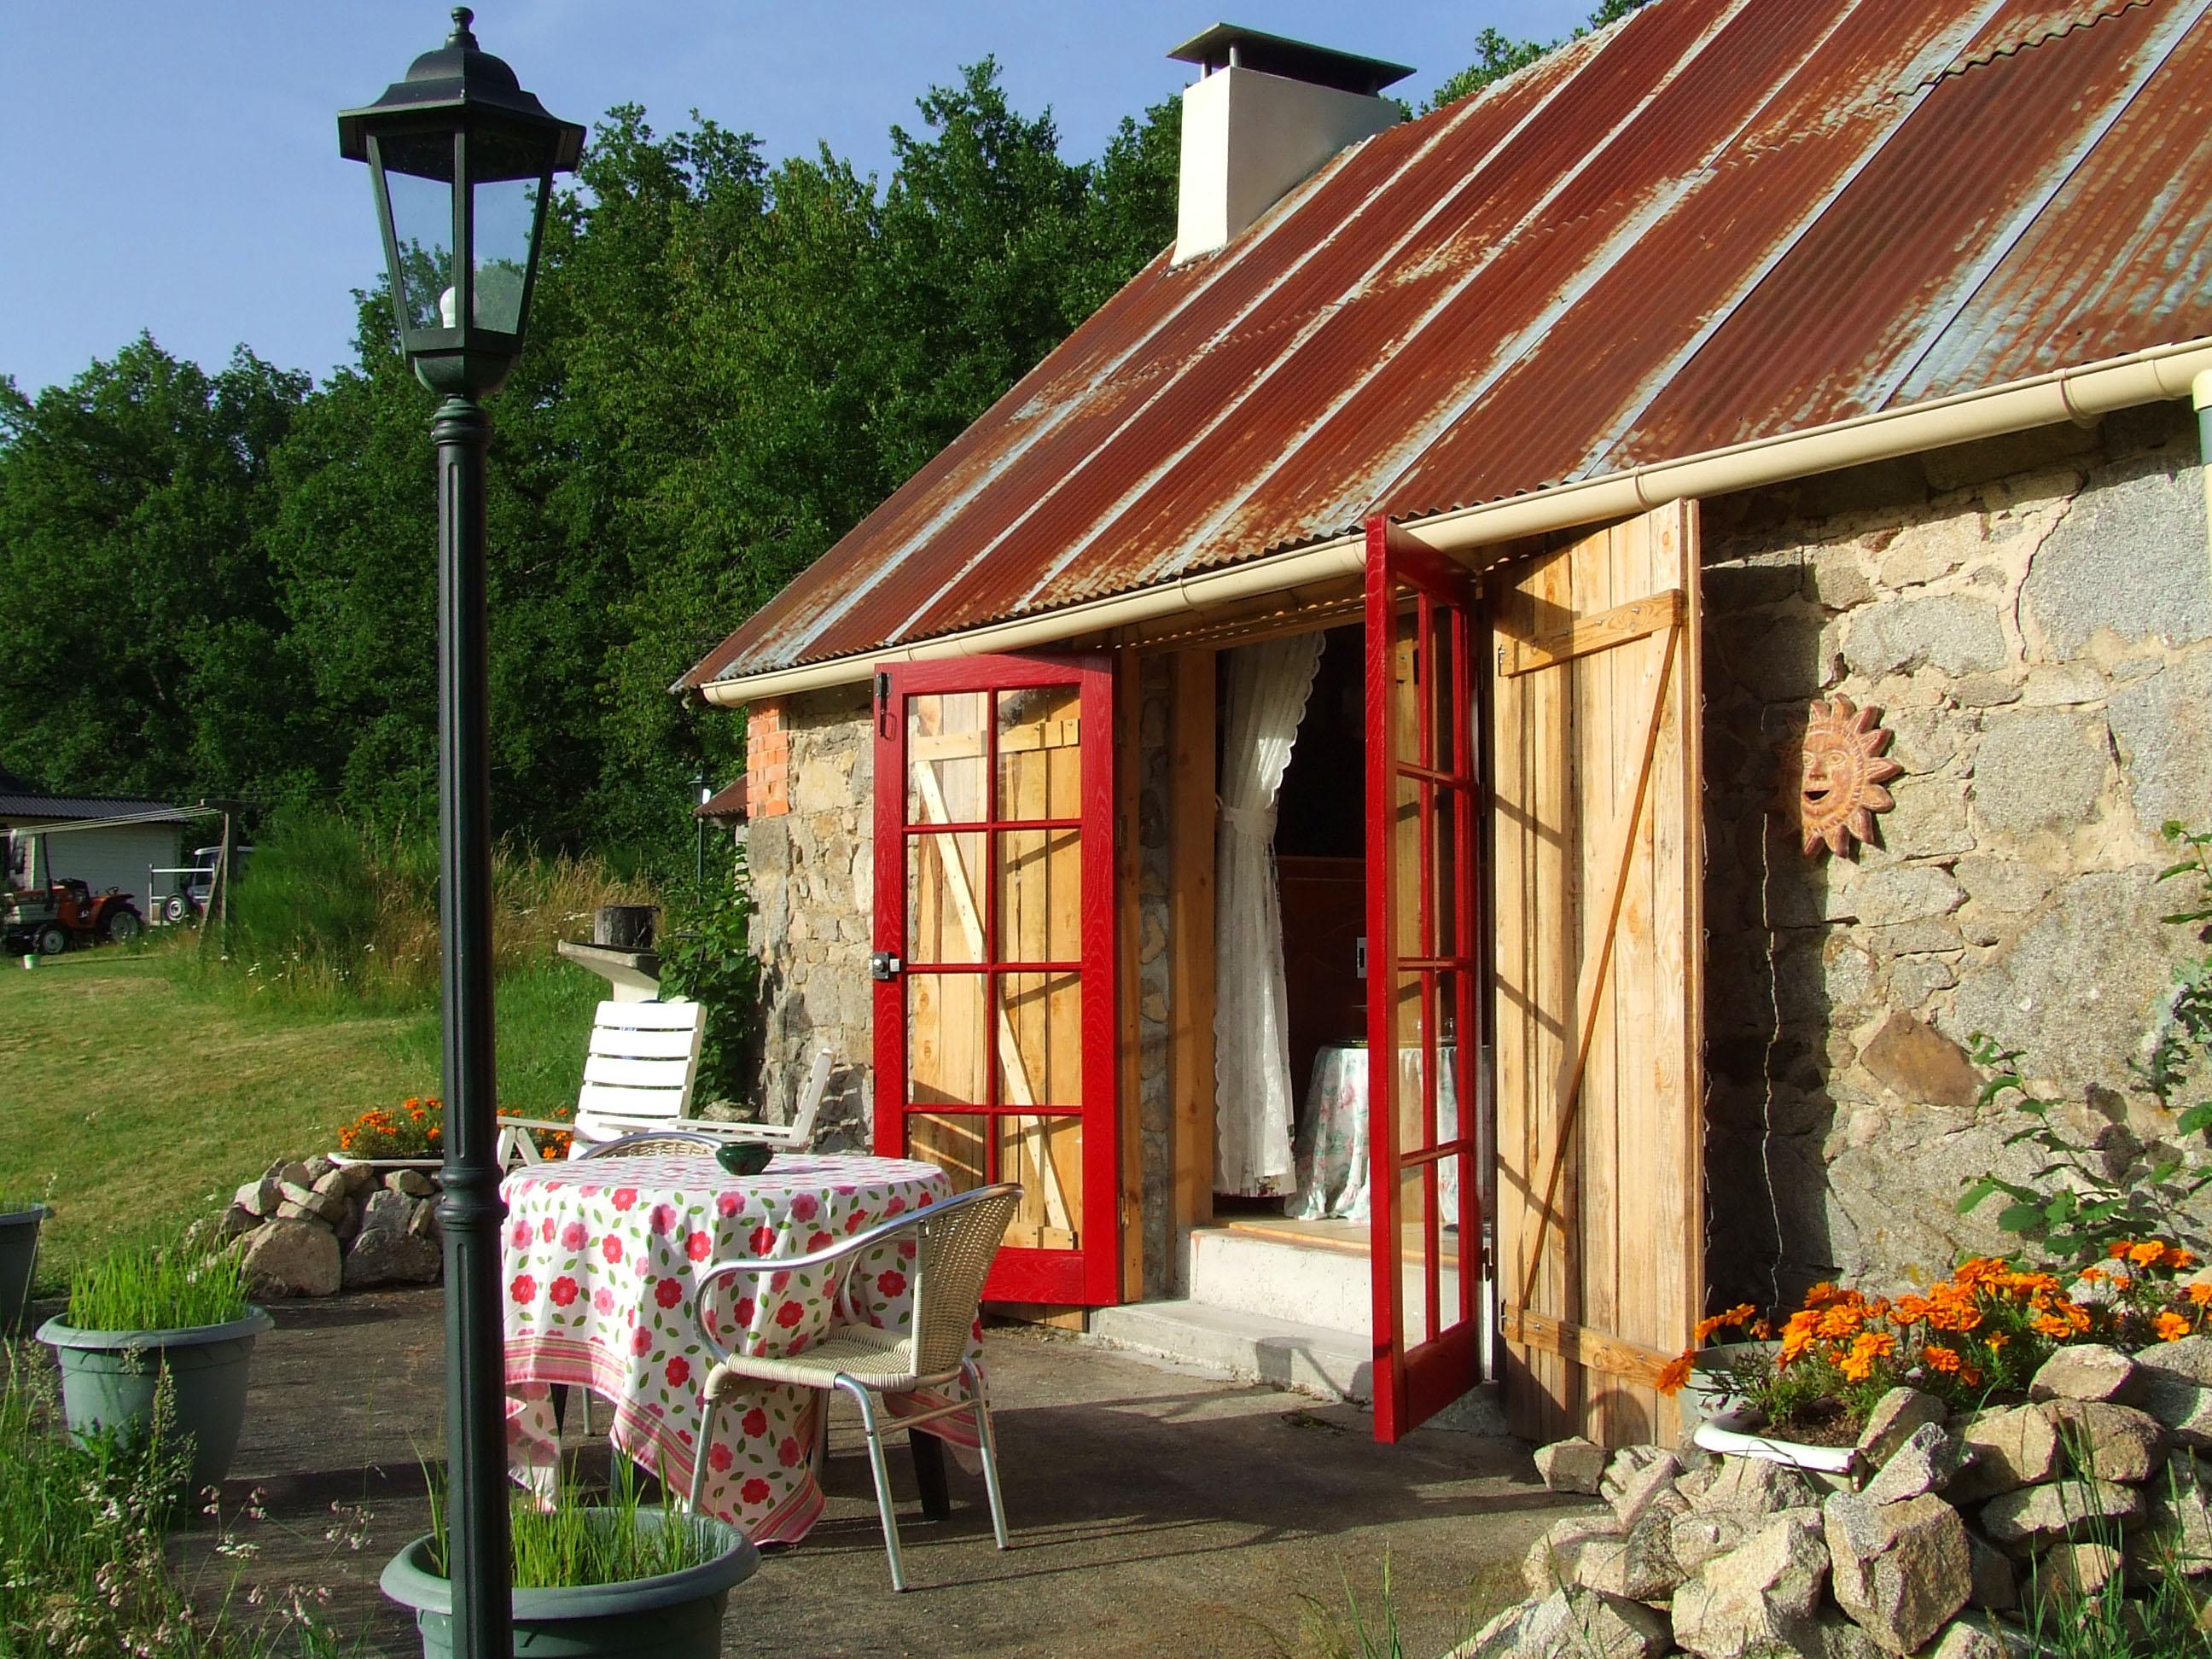 Gite camping Le Soustran